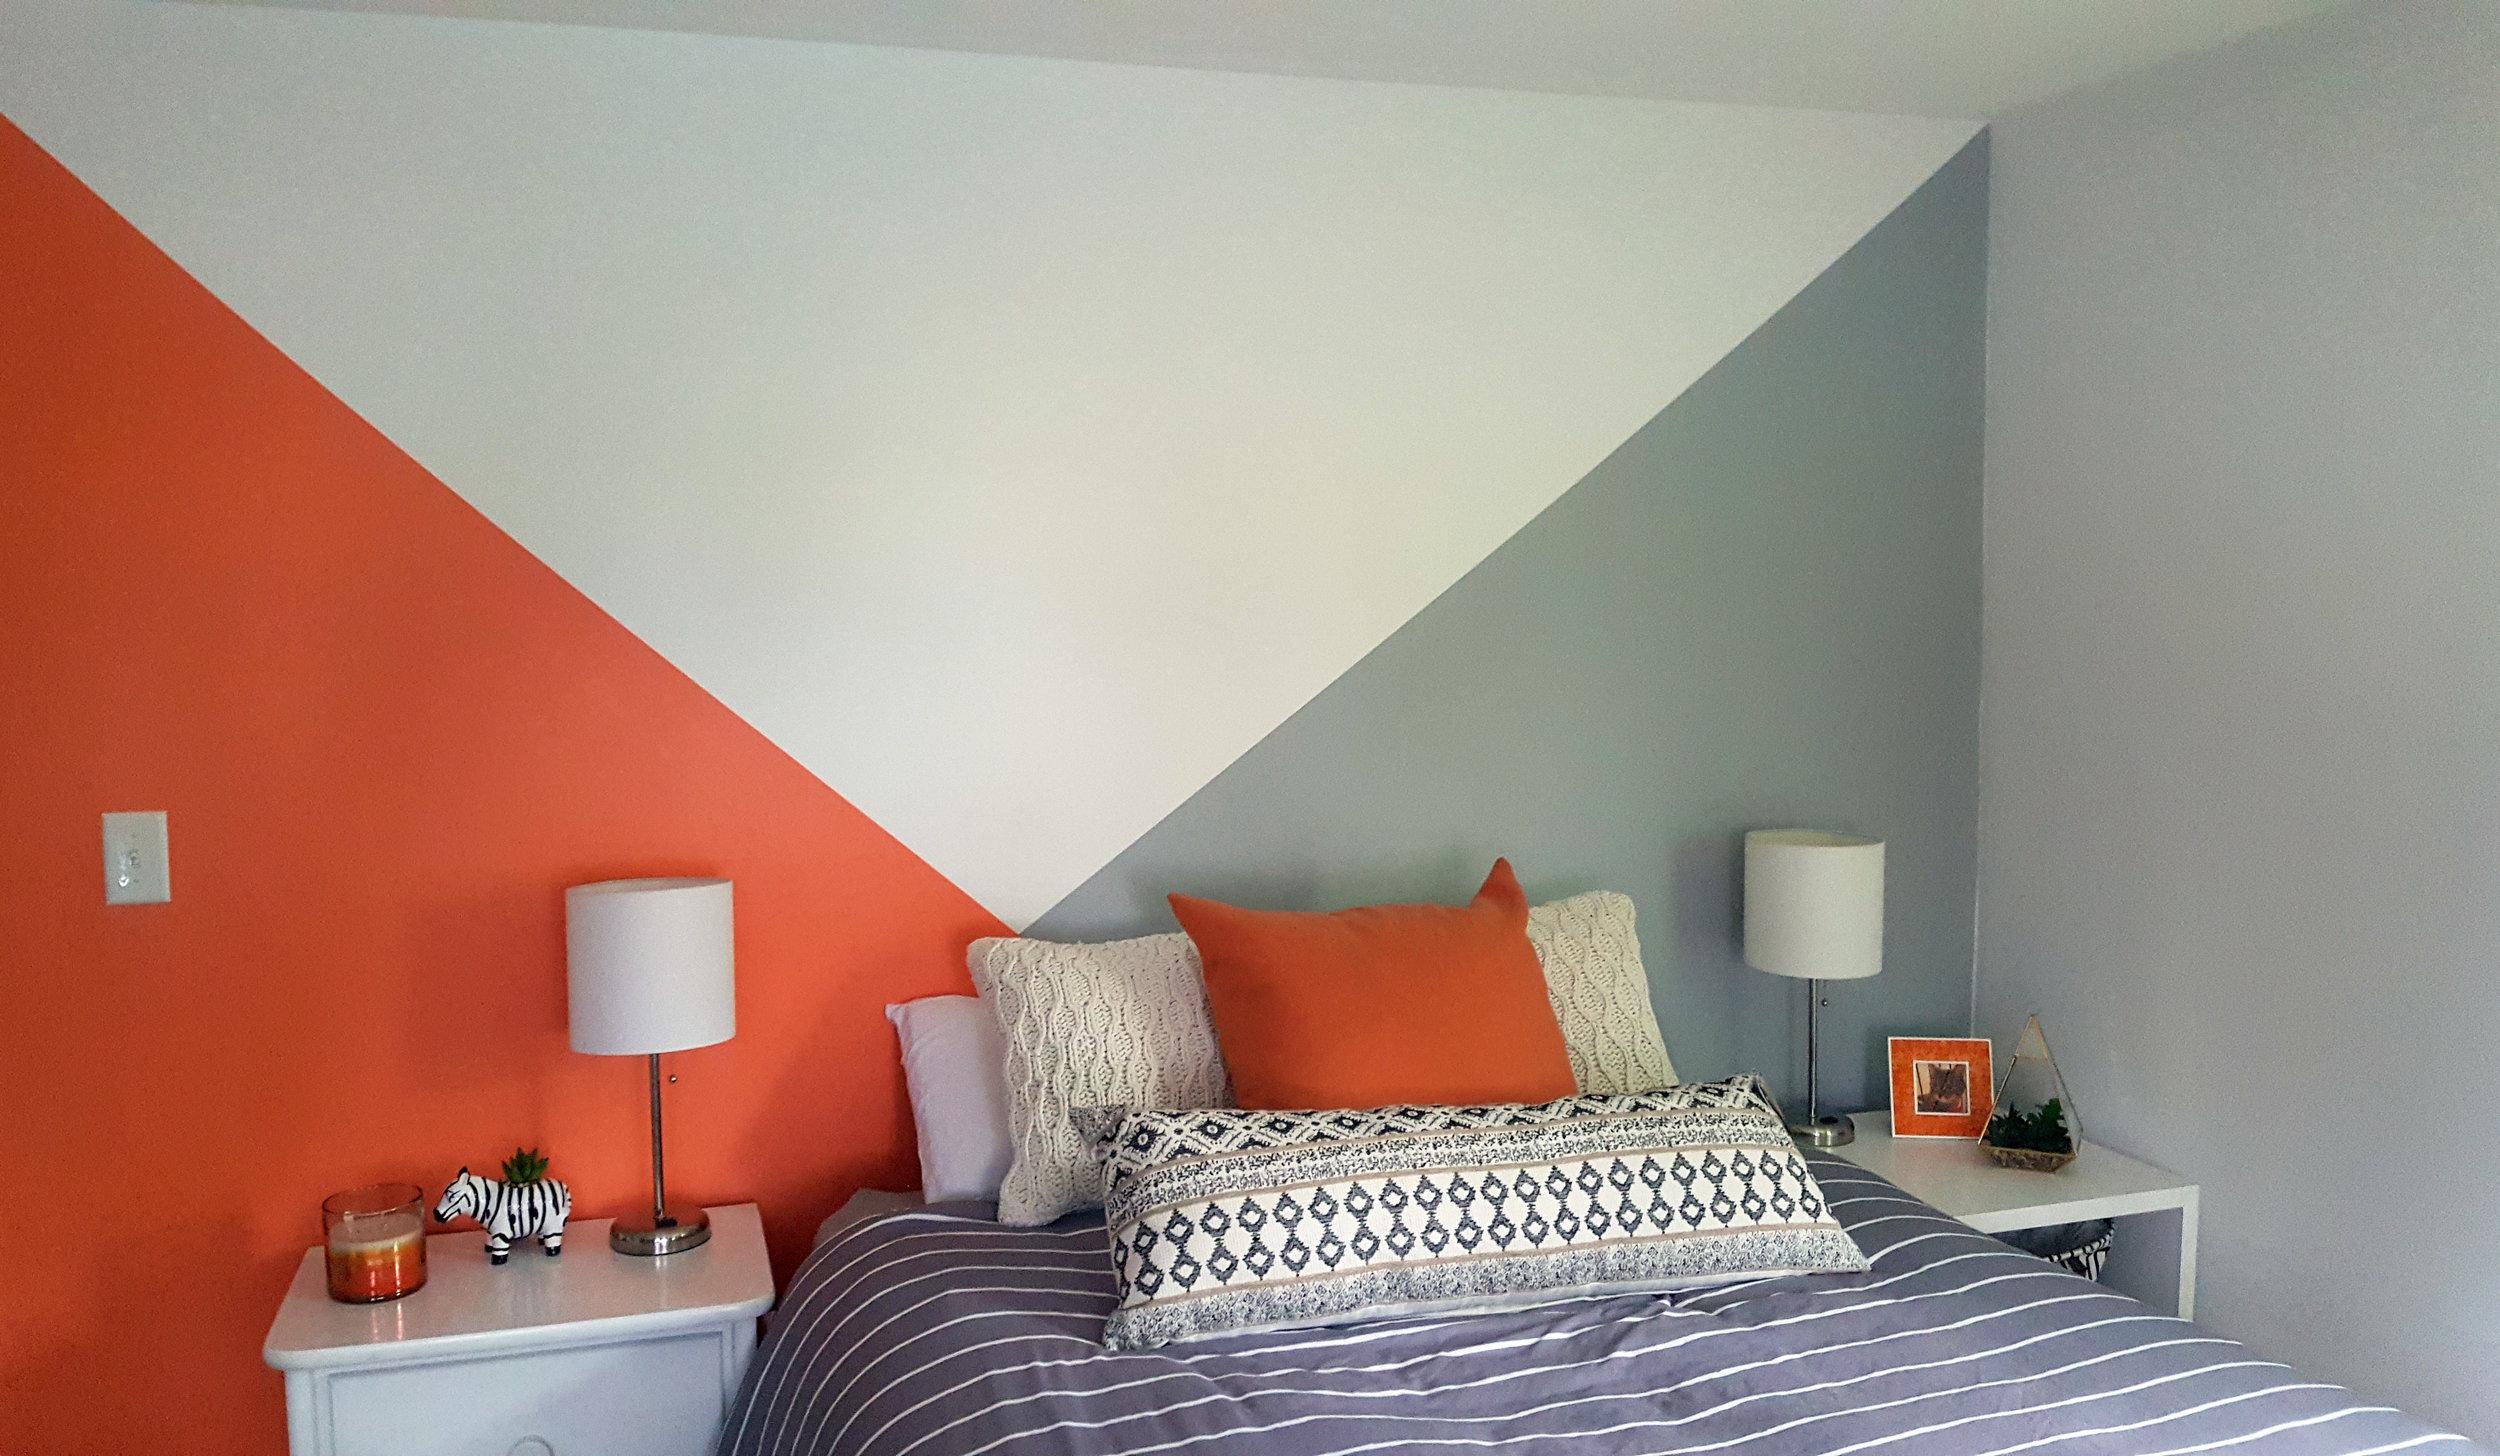 BRIGHT MODERN GEOMETRIC BEDROOM